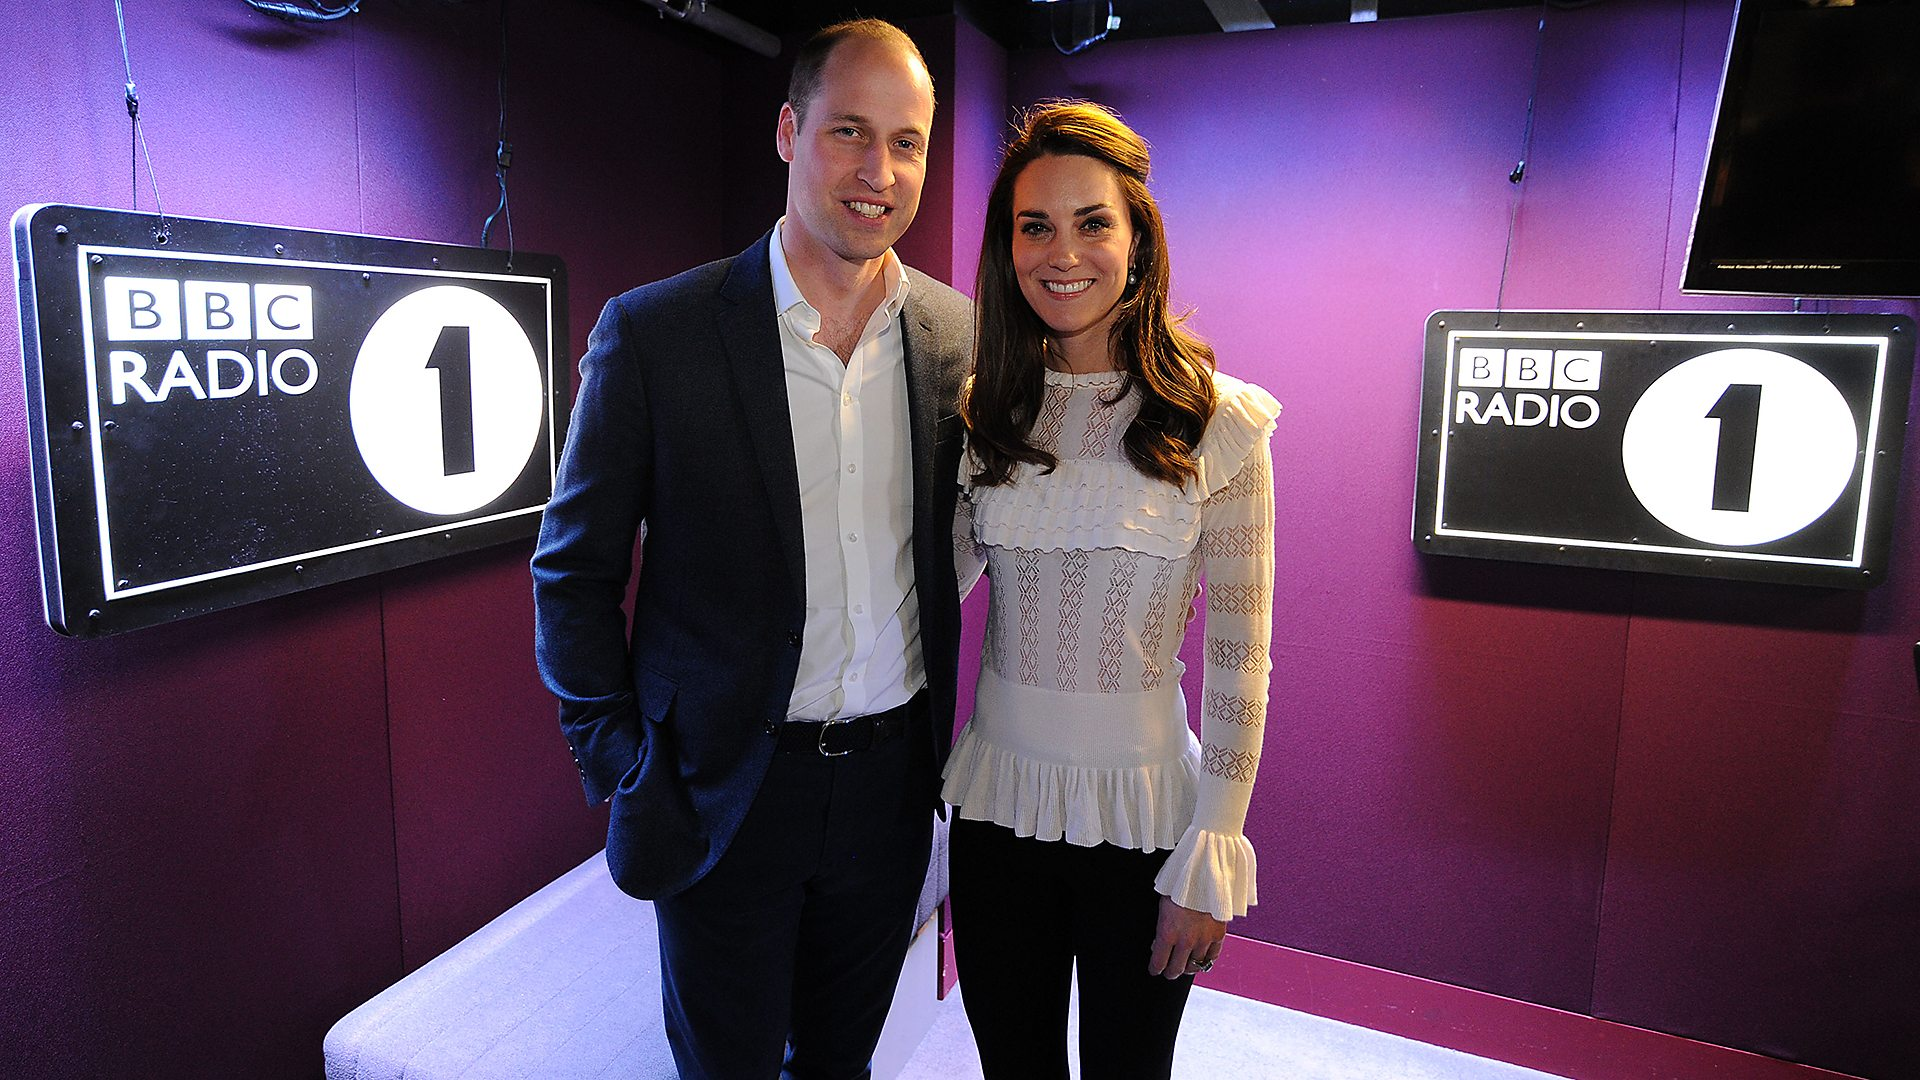 Bbc radio 1 scott mills the duke duchess of cambridge prince william reveals that he texts radio 1 using a fake name